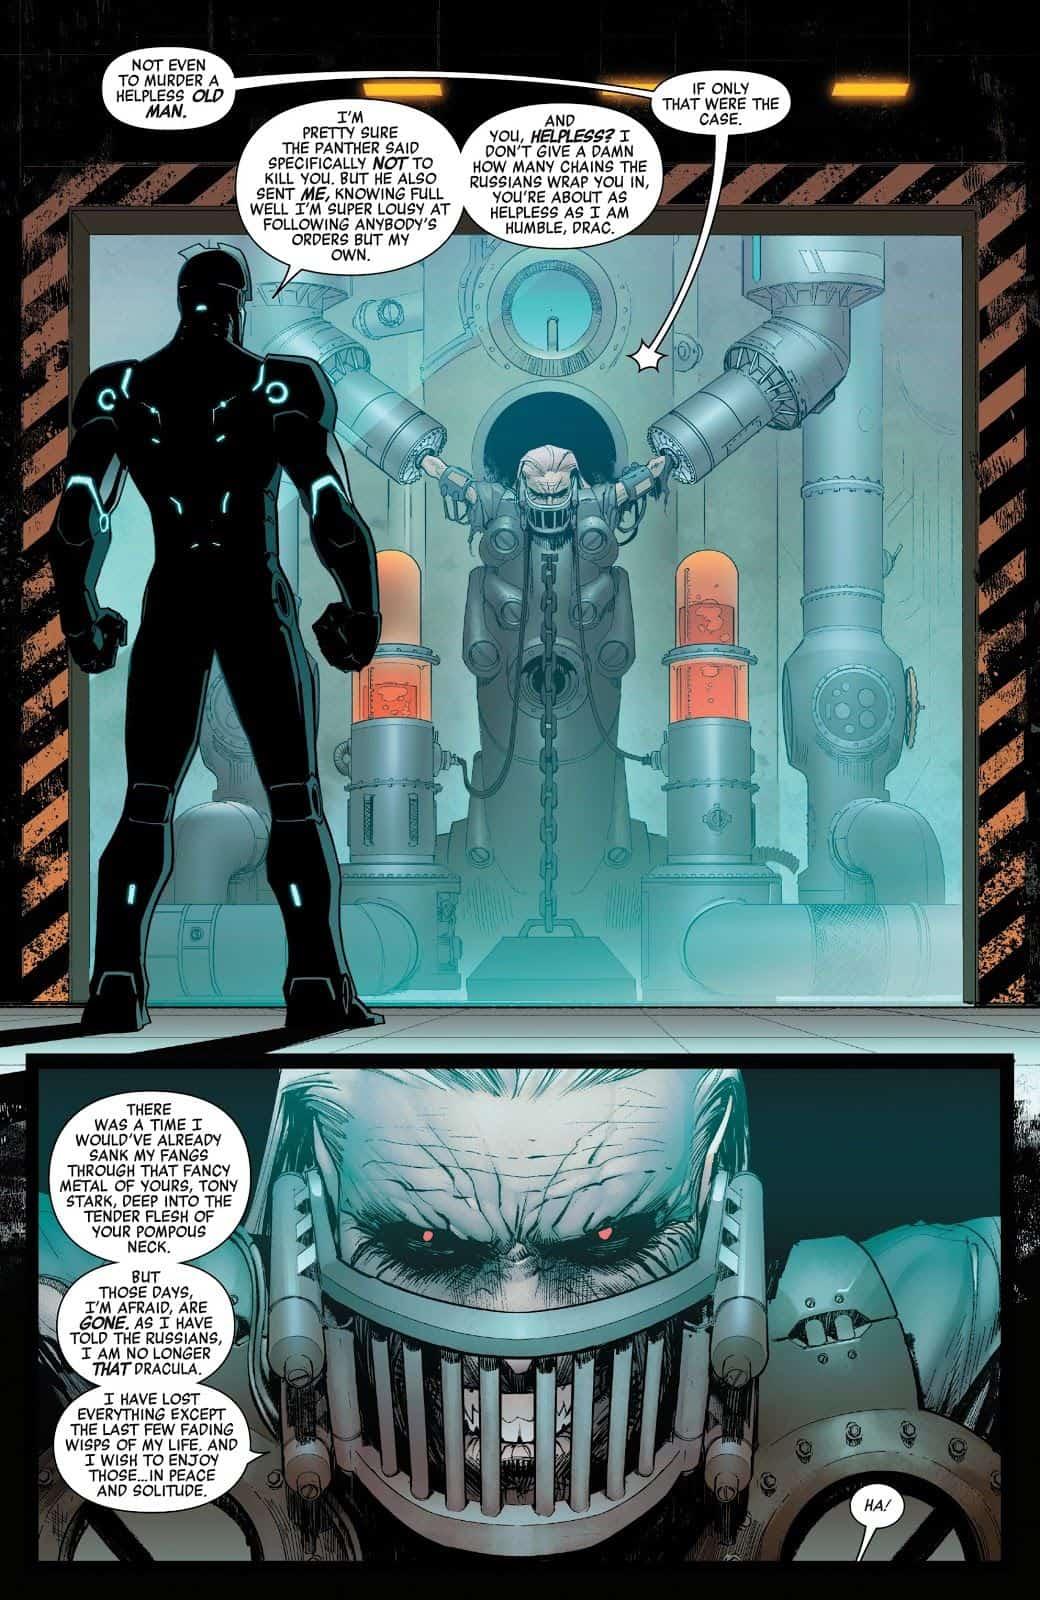 Marvel Comics Universe & Avengers #15 Spoilers: Winter Guard